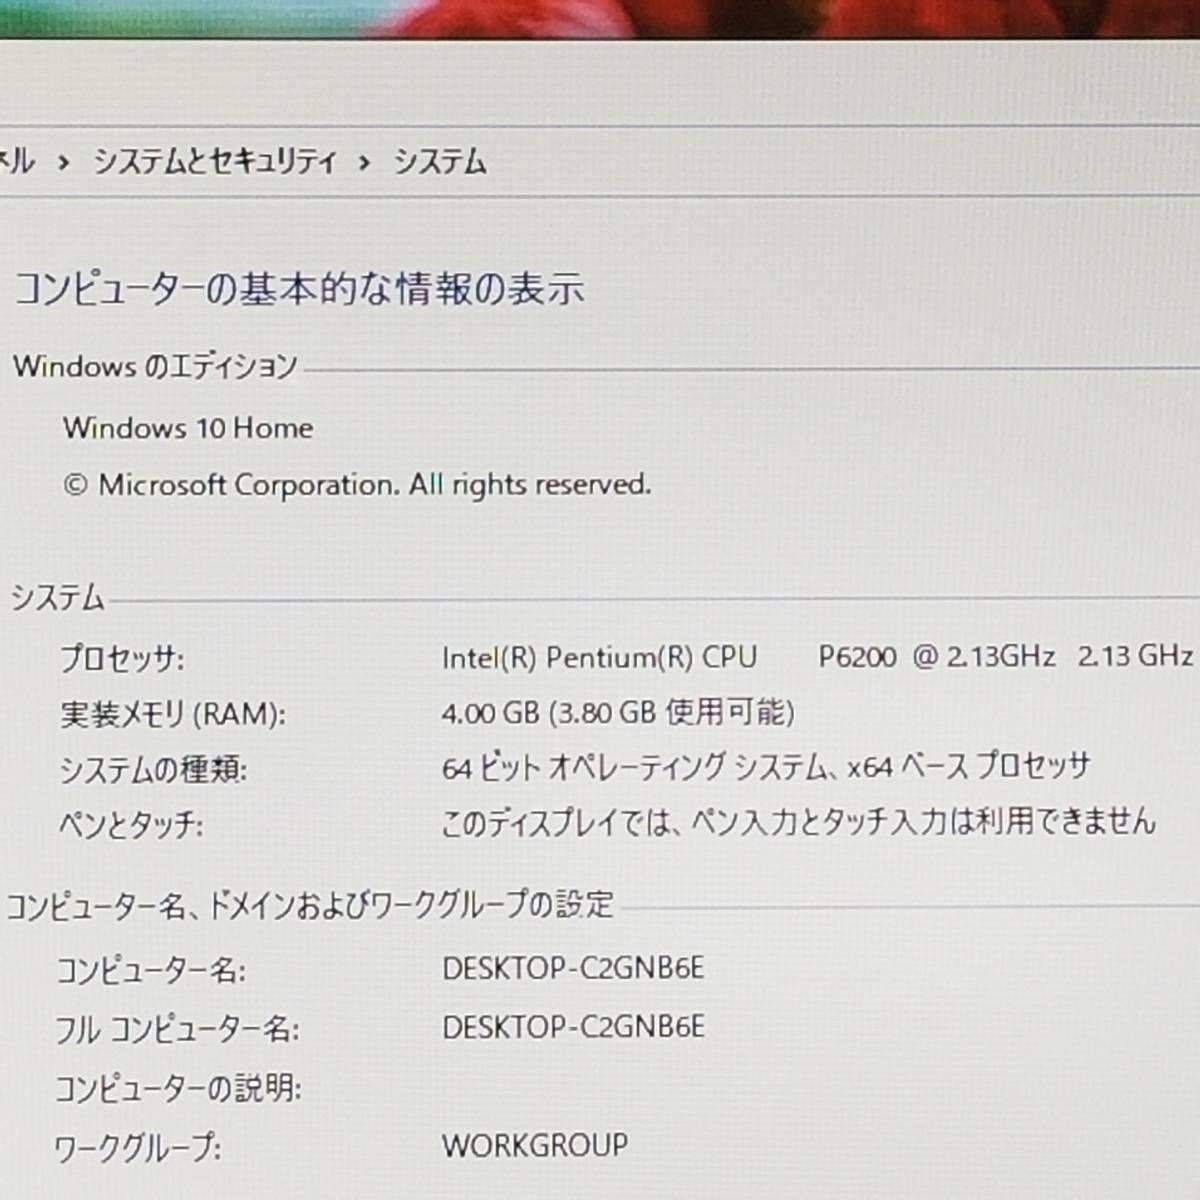 ★美品★国内正規新品SSD500GB/メモリ4GB/無線 Wi-Fi/Win10/最新Office/高性能Pentium P6200搭載/LaVie S LS150/ES6R(C7744)_★Windows10 Home 搭載★